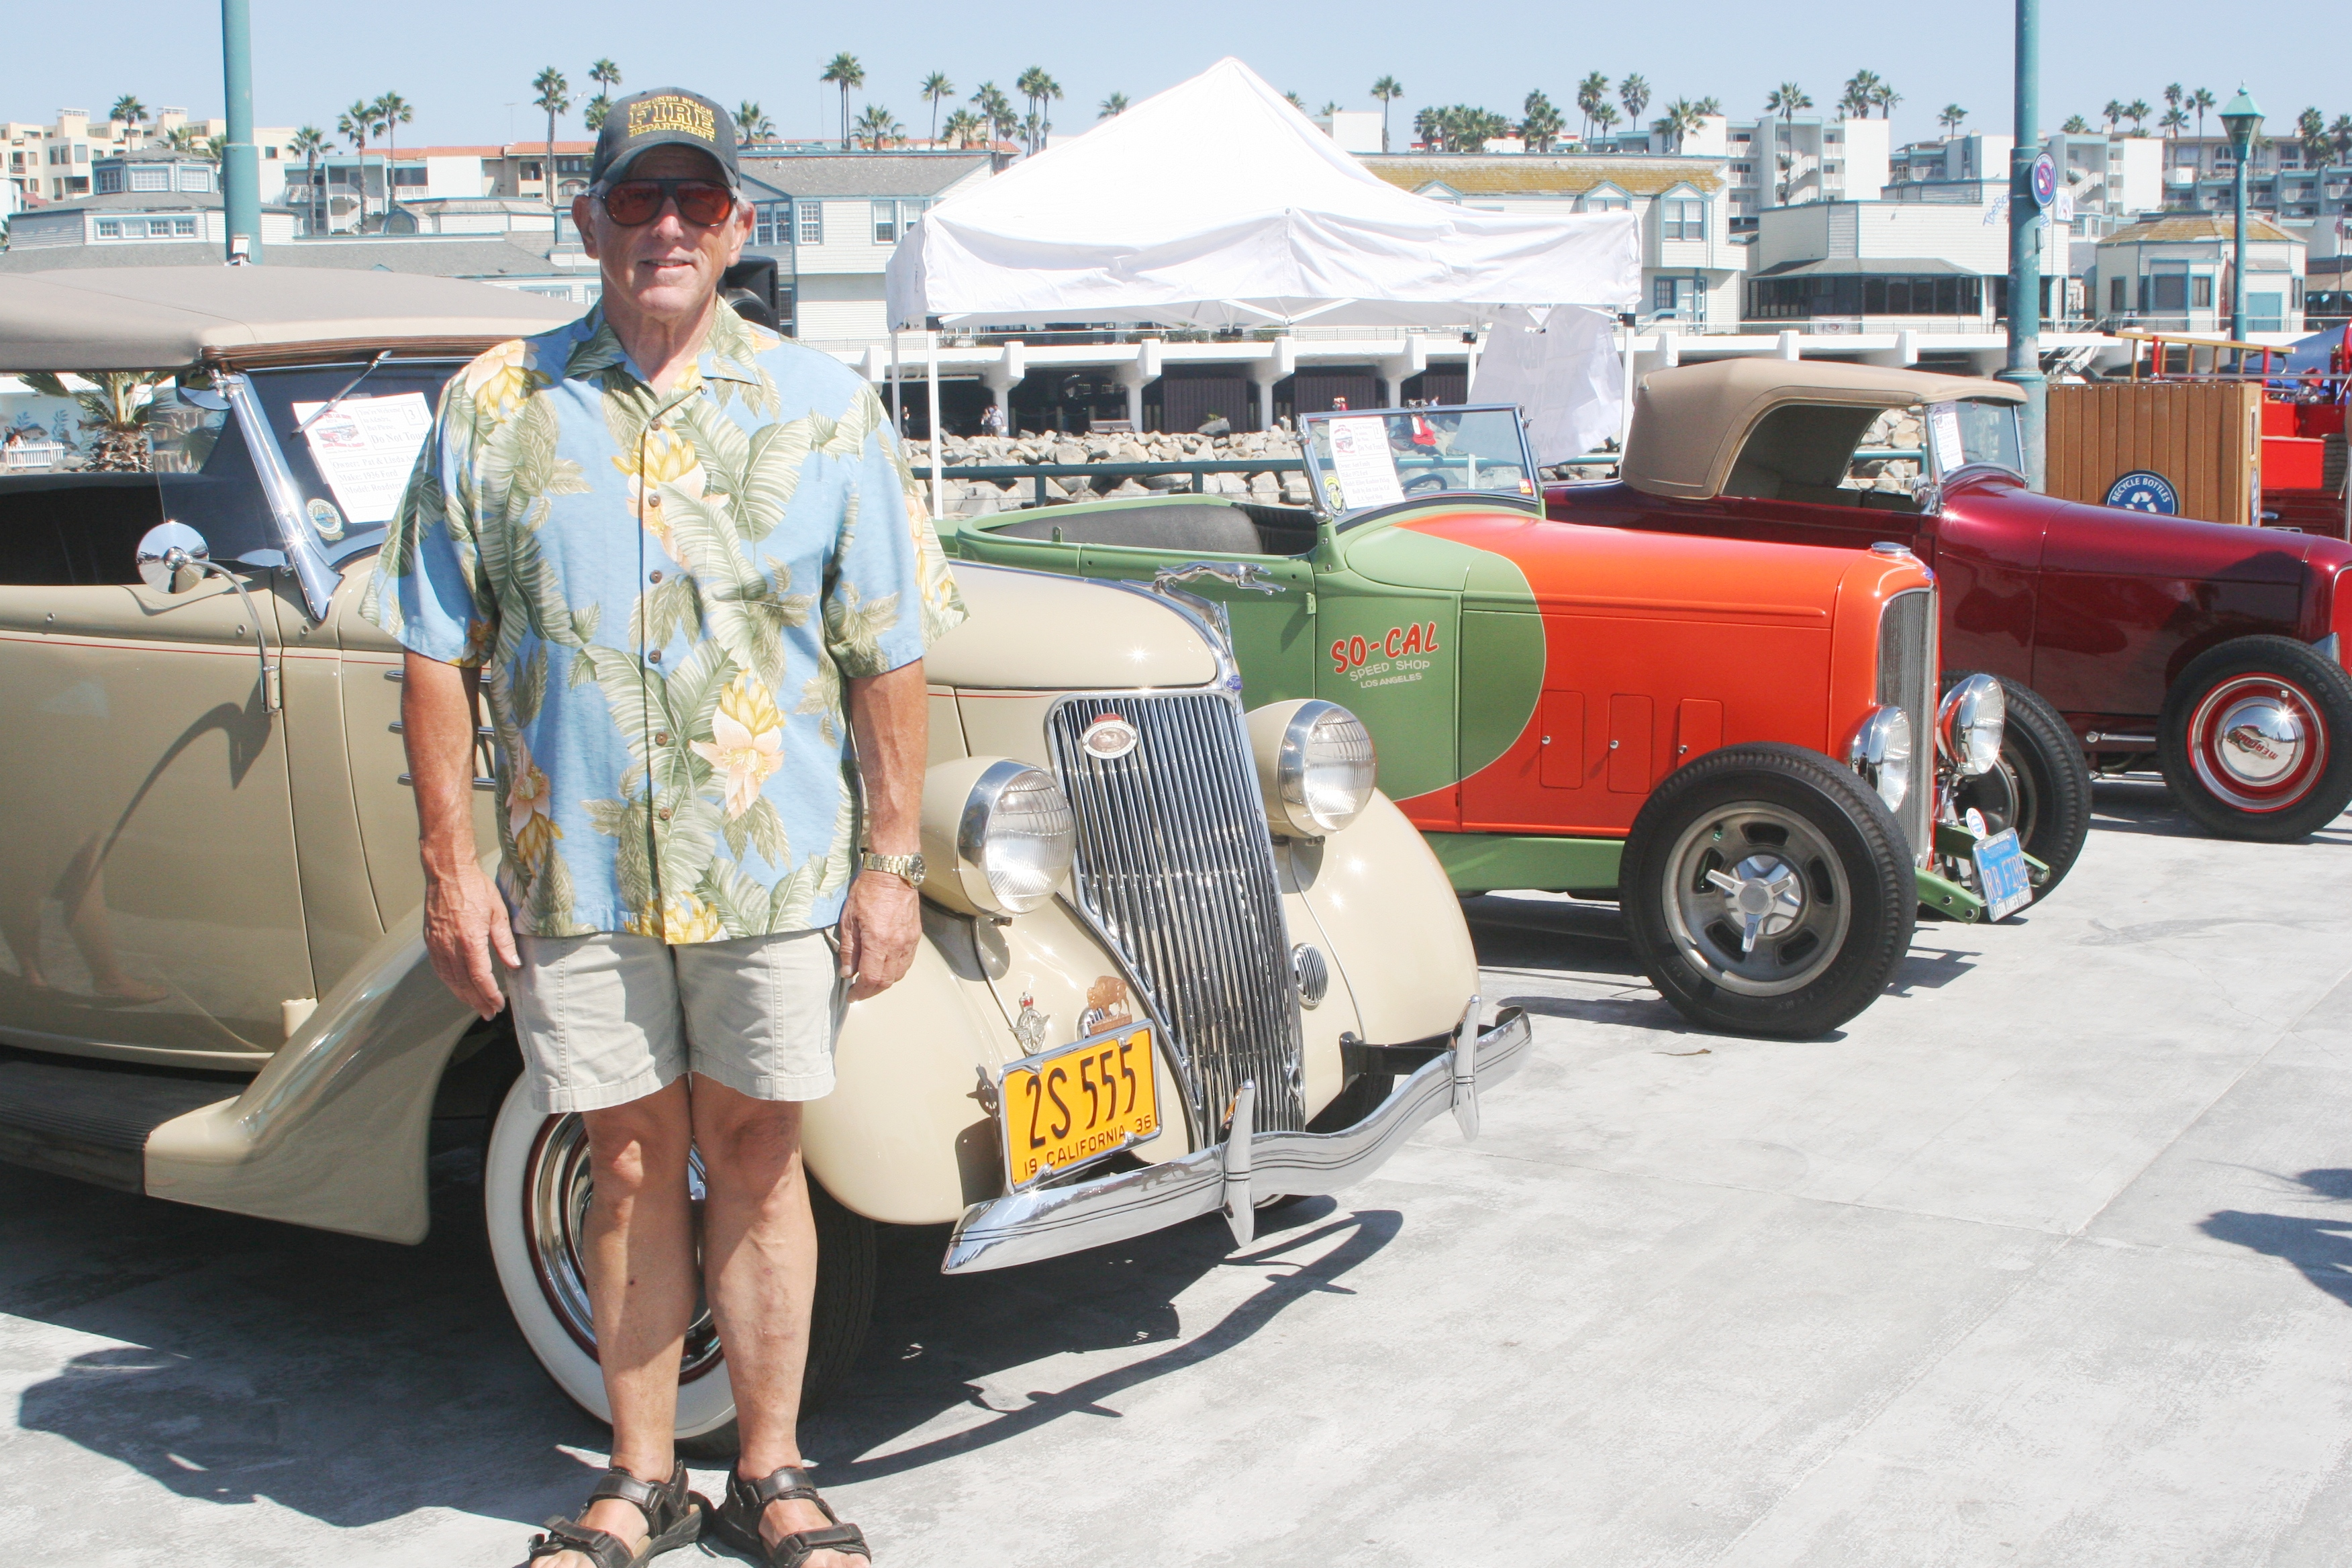 Summer Calendar Rods Rides And Relics Classic Car Show - Car show calendar